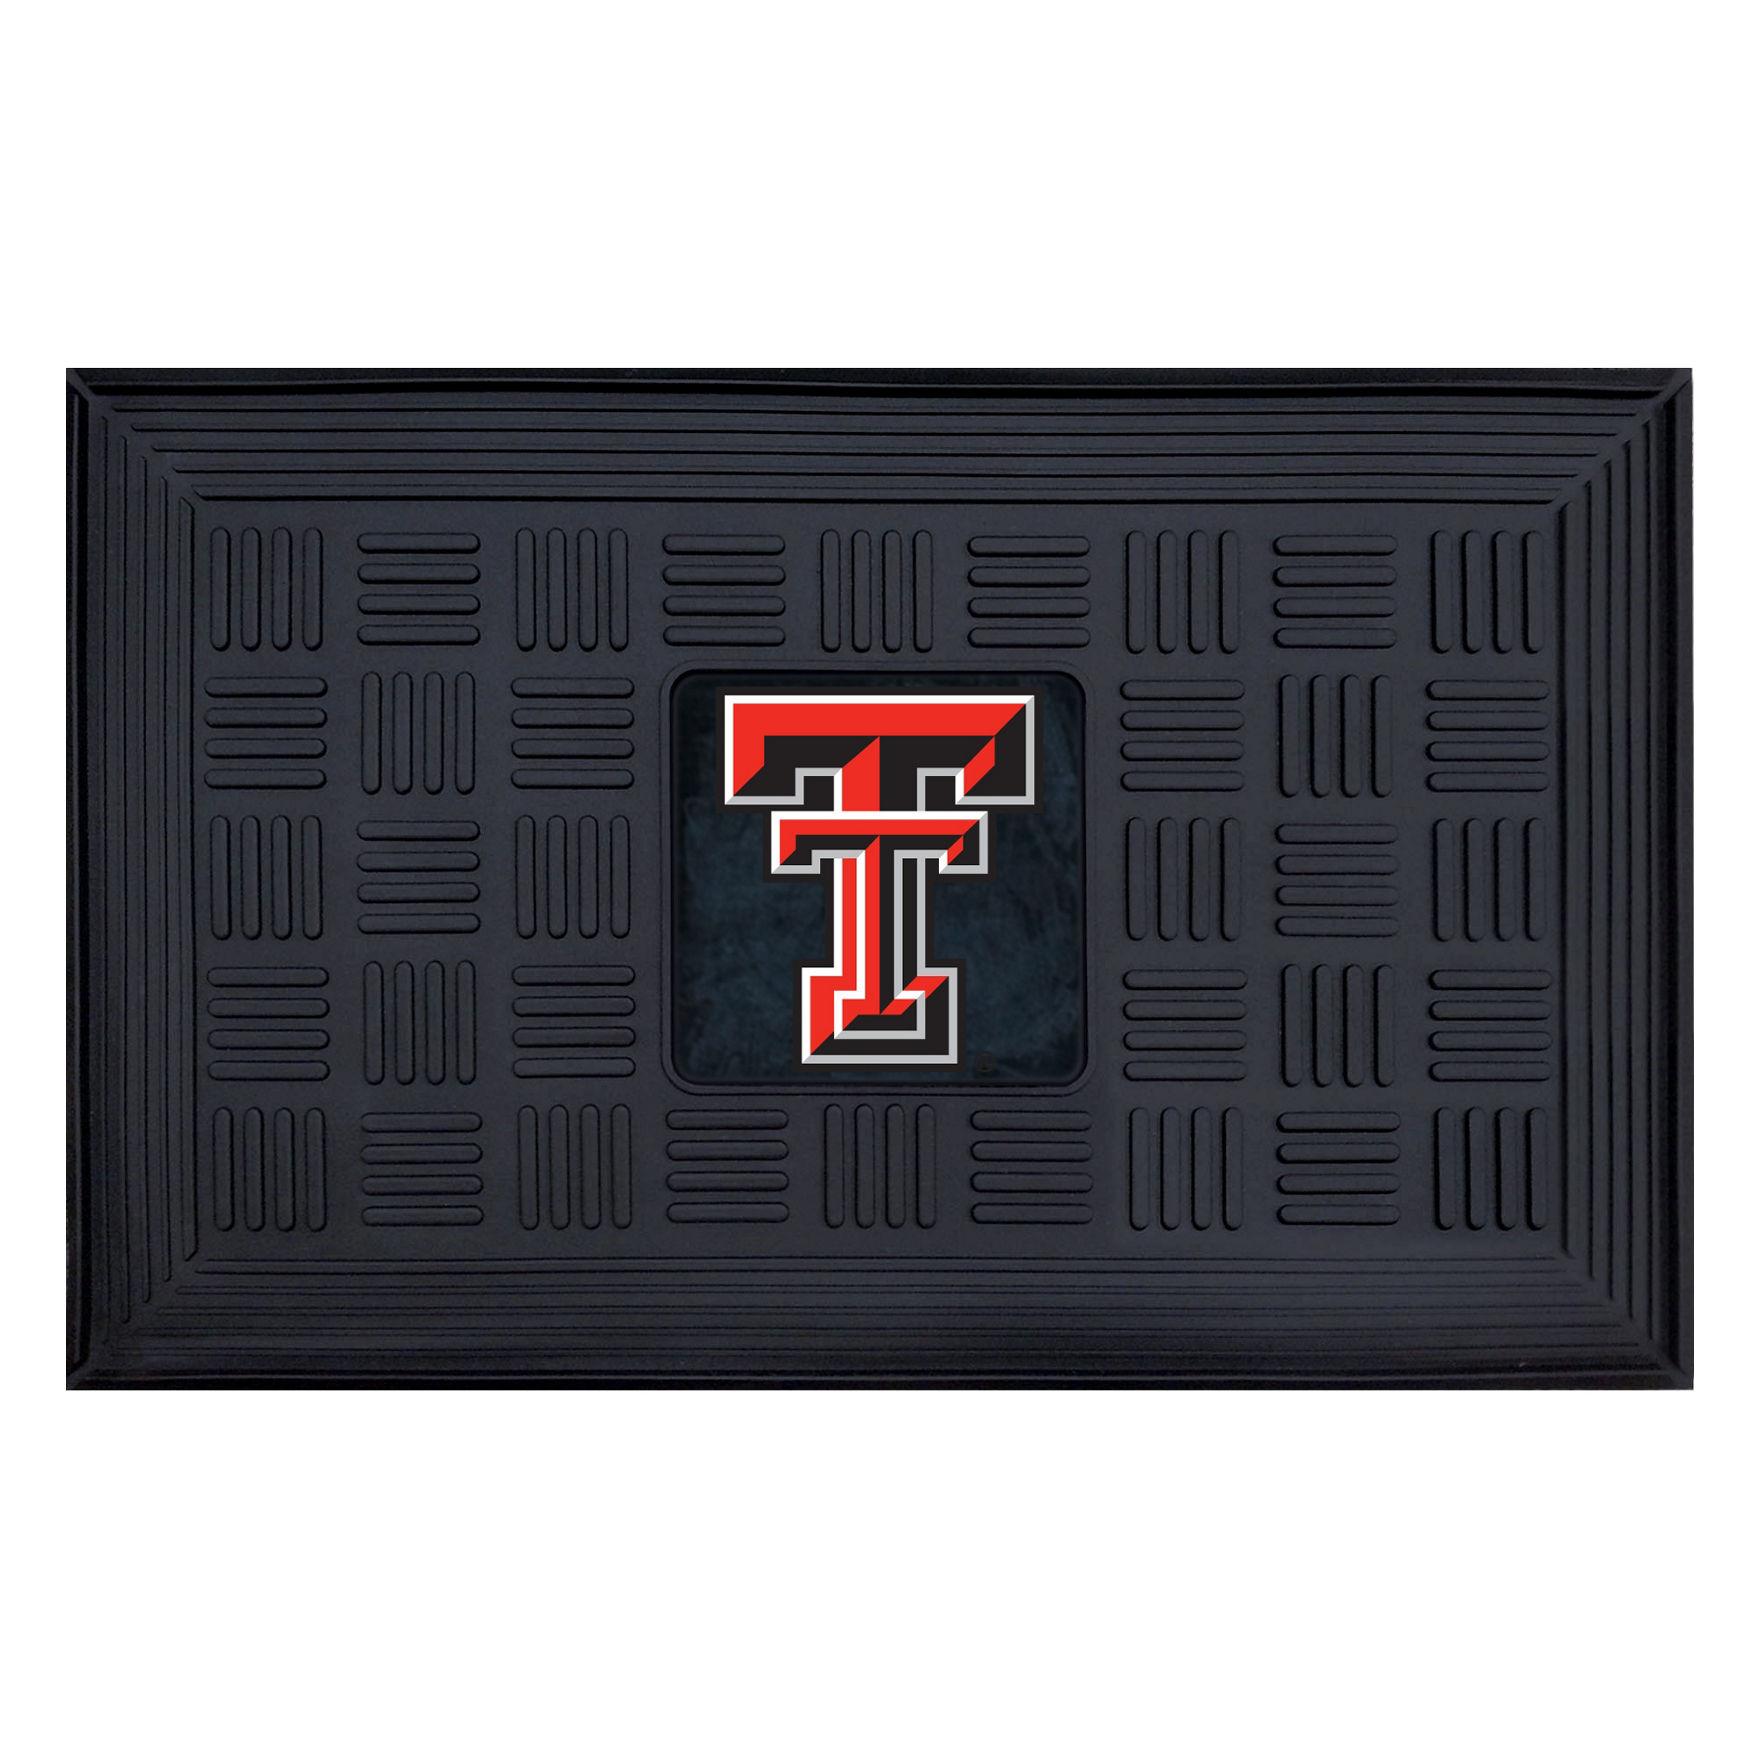 Fanmats Black Accent Rugs Outdoor Rugs & Doormats Outdoor Decor Rugs